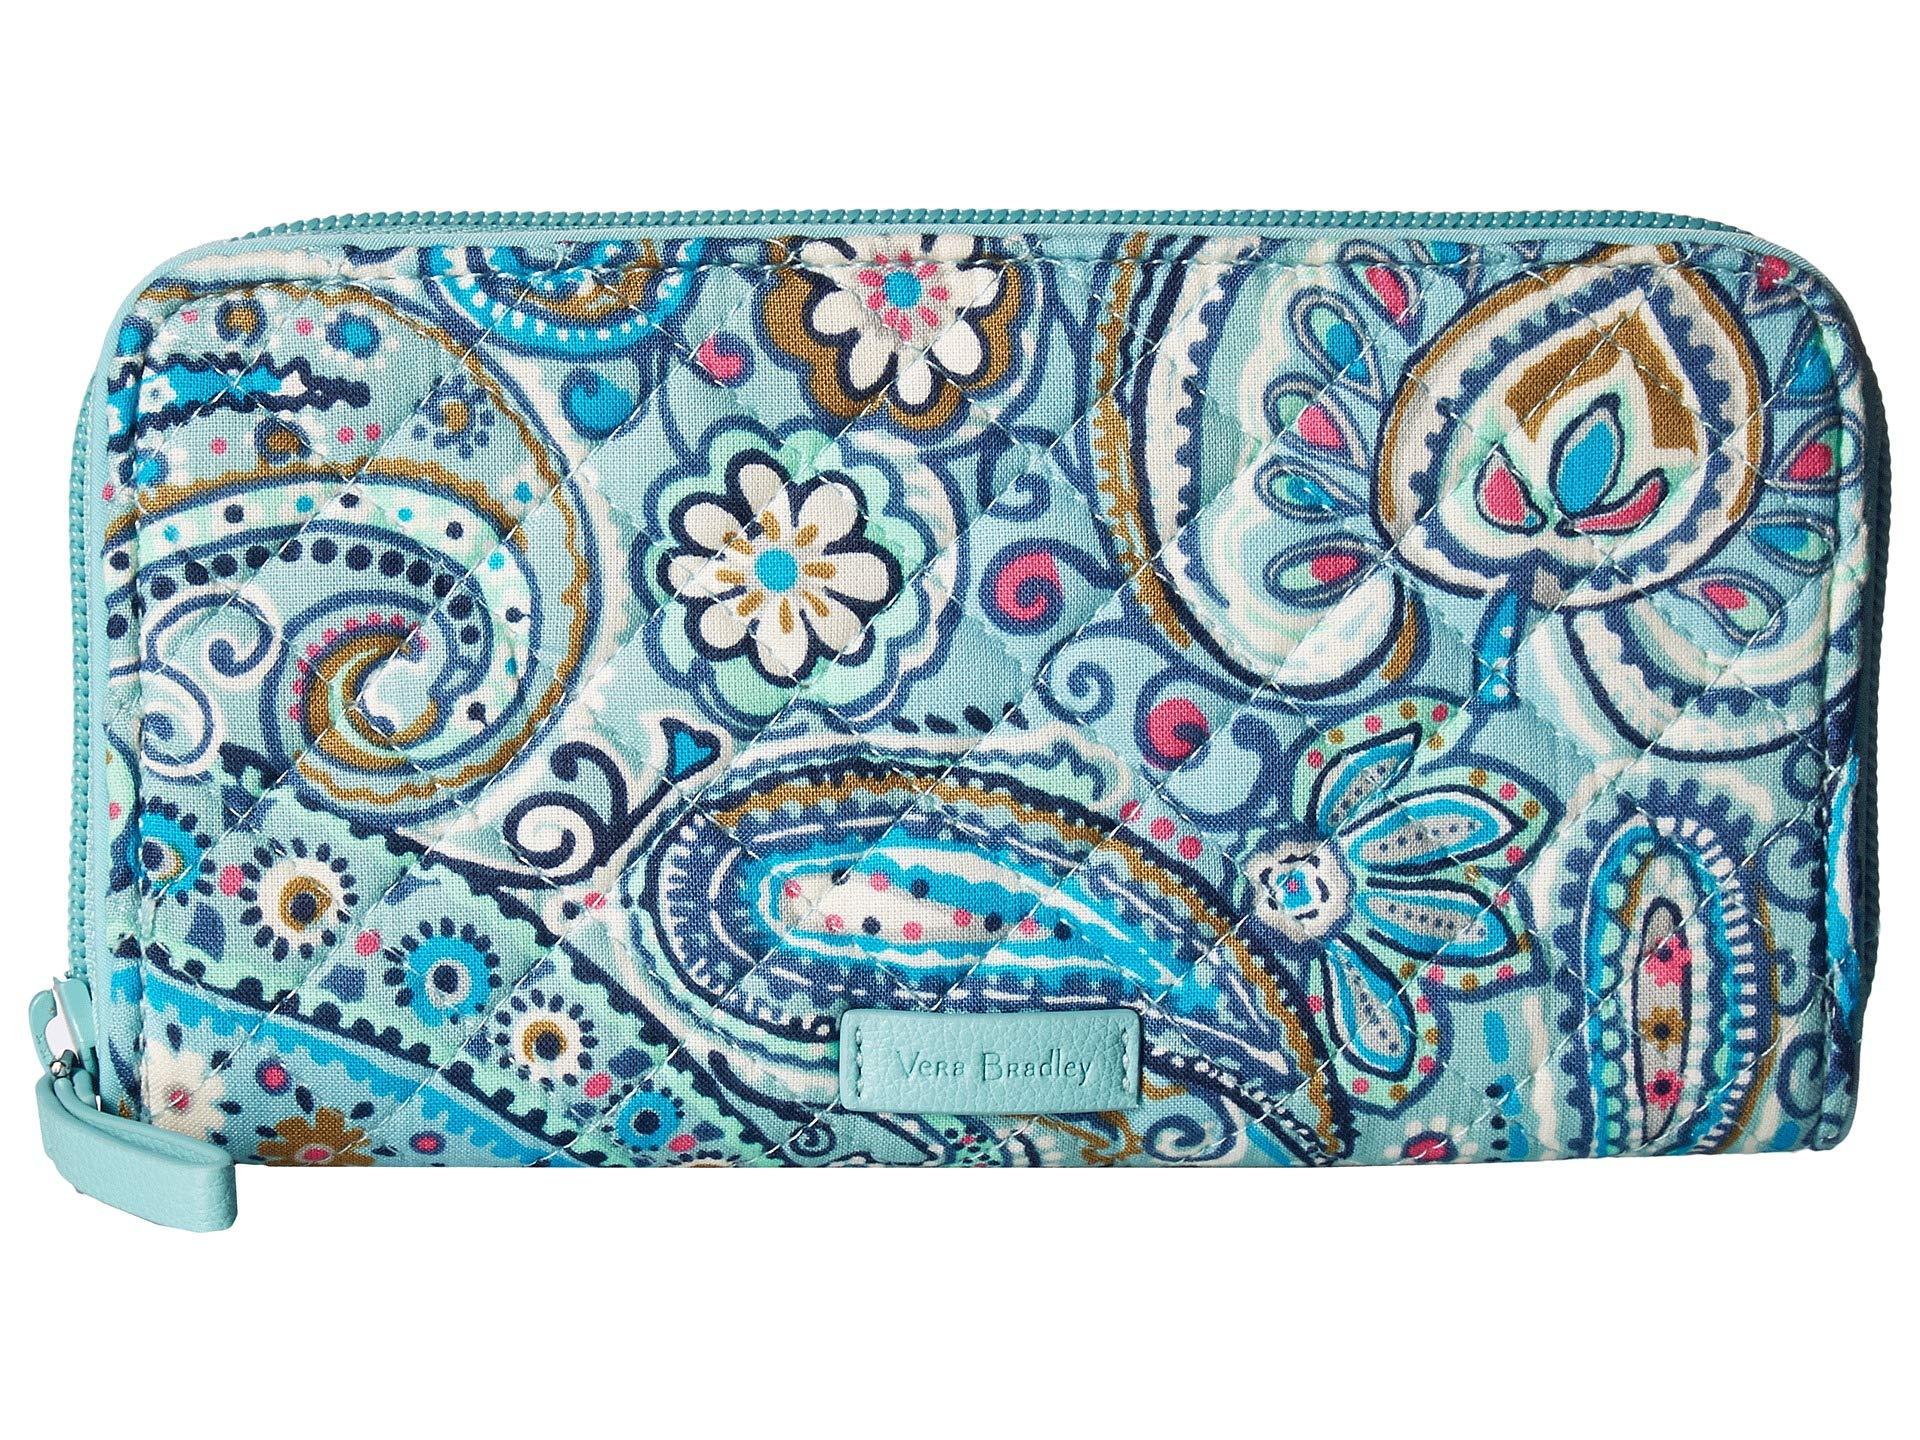 Vera Iconic Wallet Paisley Rfid Daisy Georgia Bradley Dot ZZq15rw